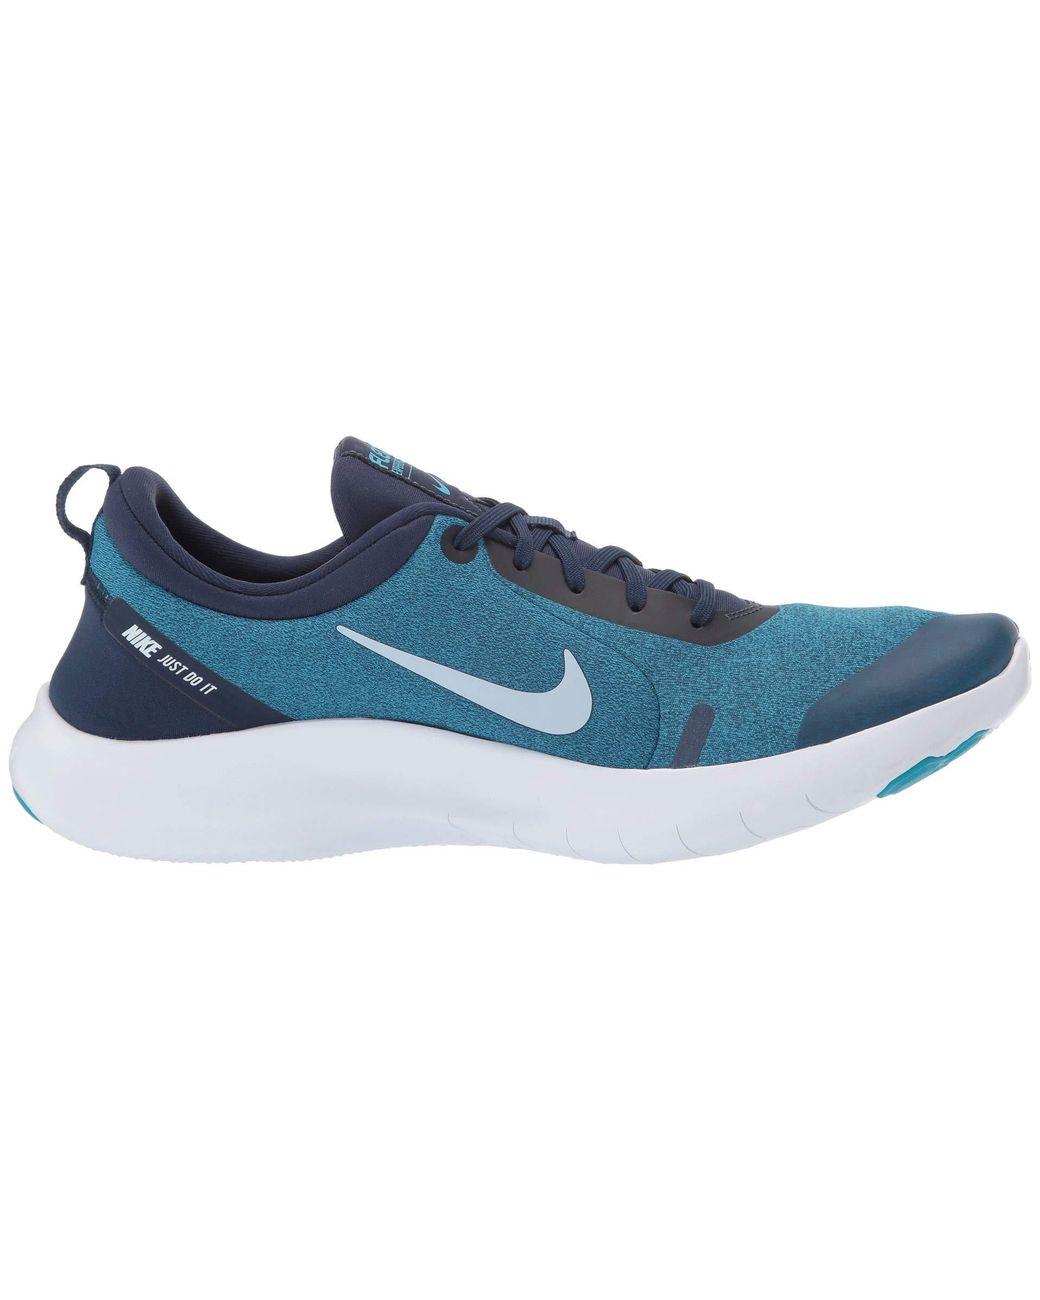 47bedacb3739 Lyst - Nike Flex Experience Rn 8 (midnight Navy white monsoon Blue) Men s  Running Shoes in Blue for Men